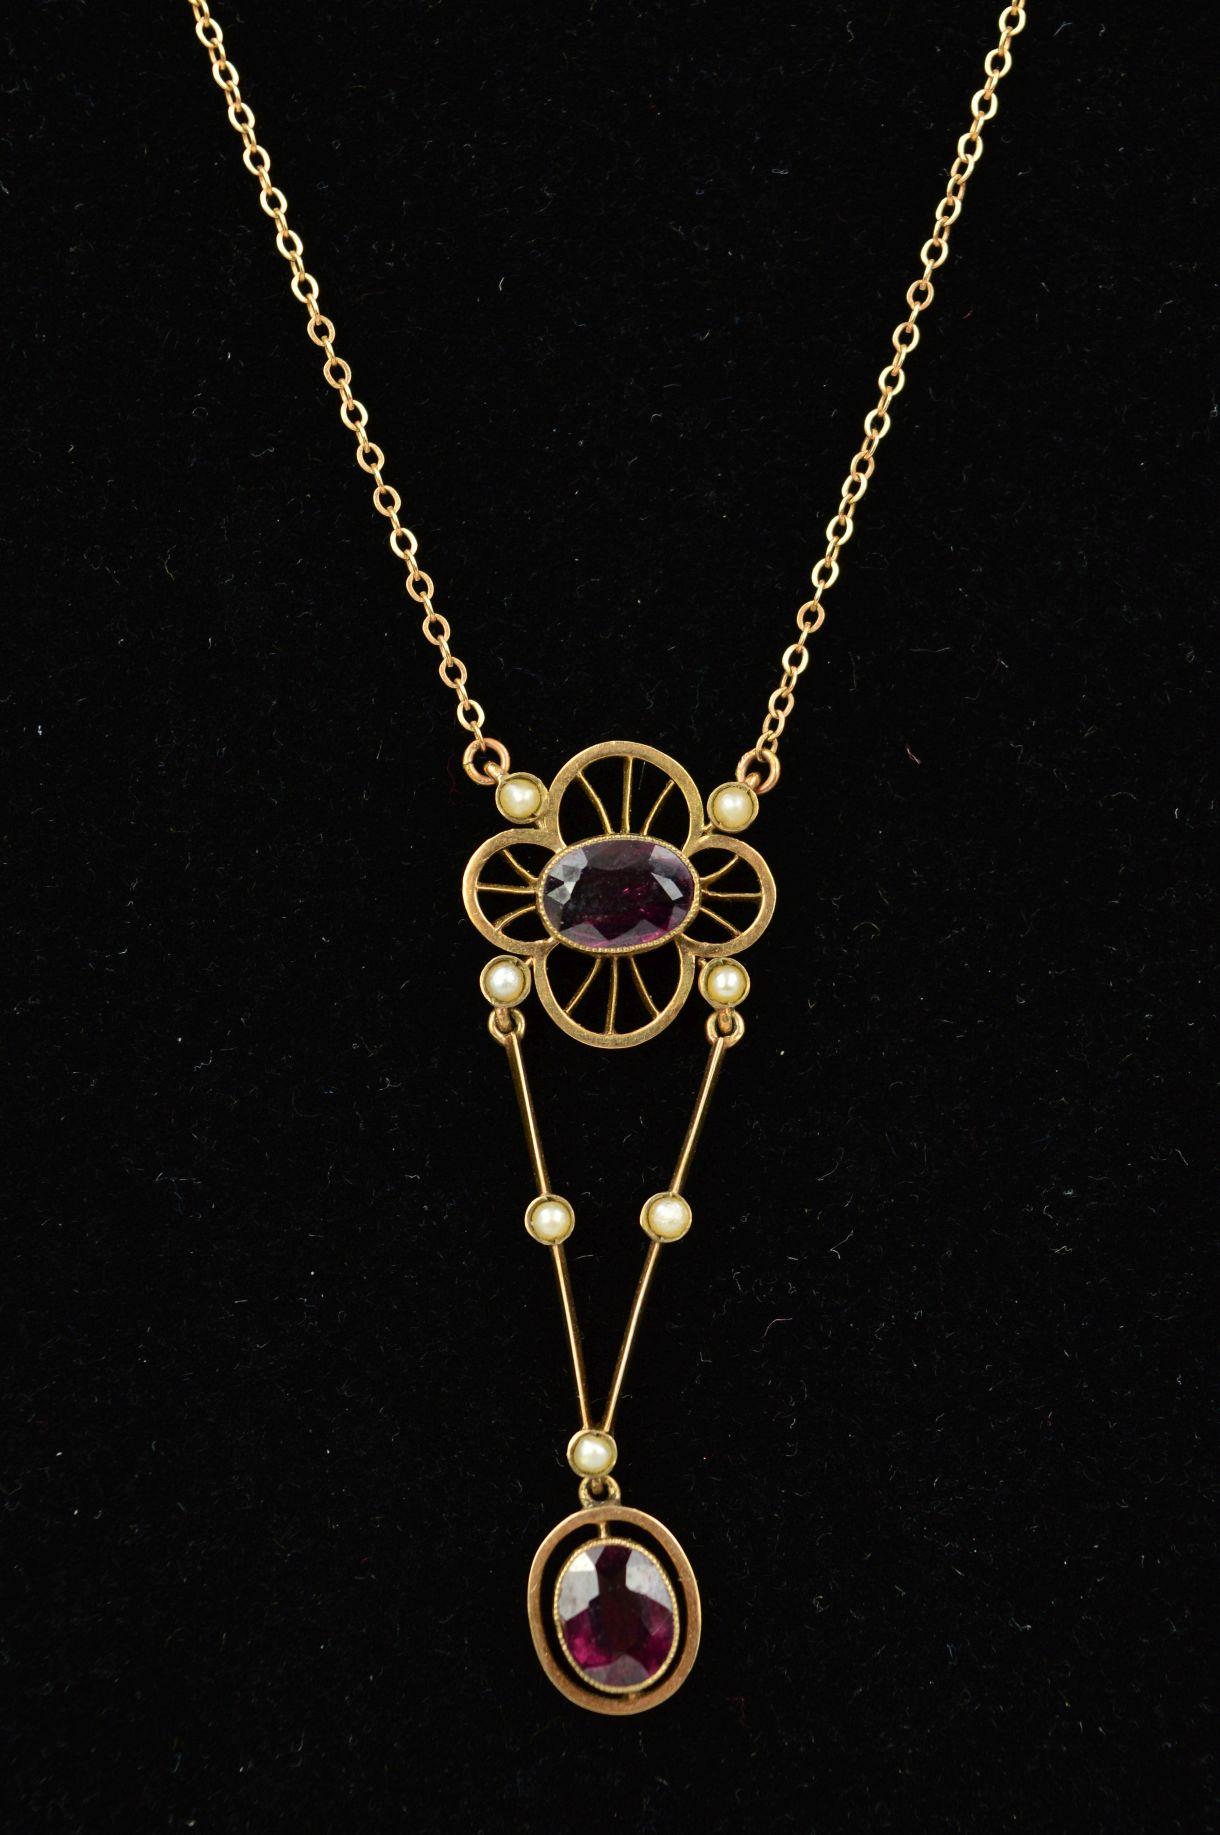 Lot 31 - AN EARLY 20TH CENTURY GOLD GEM PENDANT designed as an oval garnet within an open flower shape